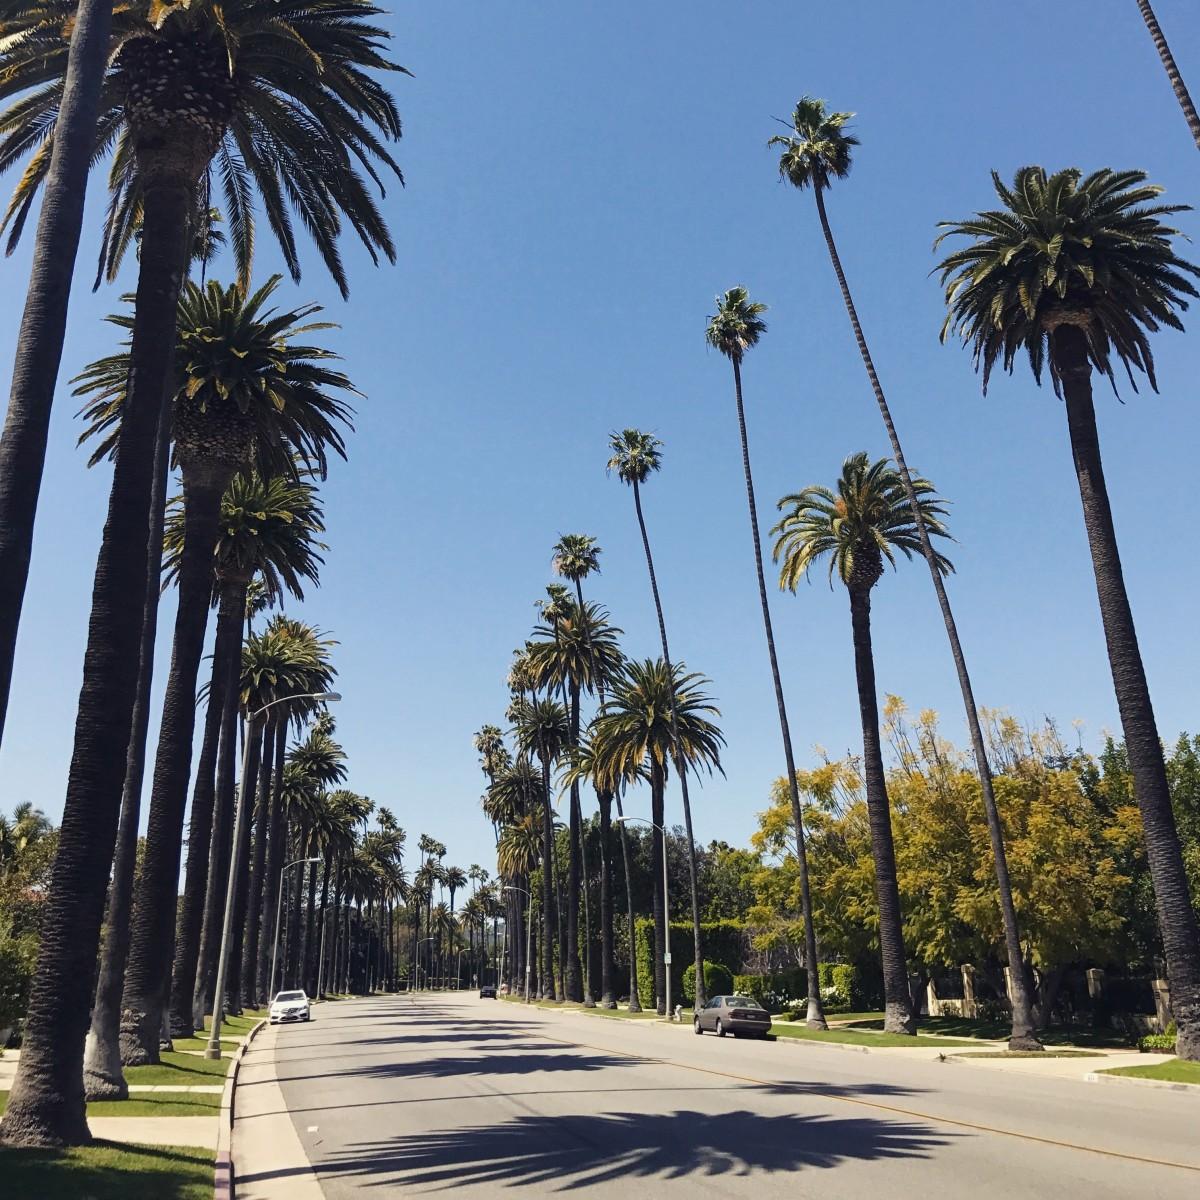 Los Angeles Rehberi